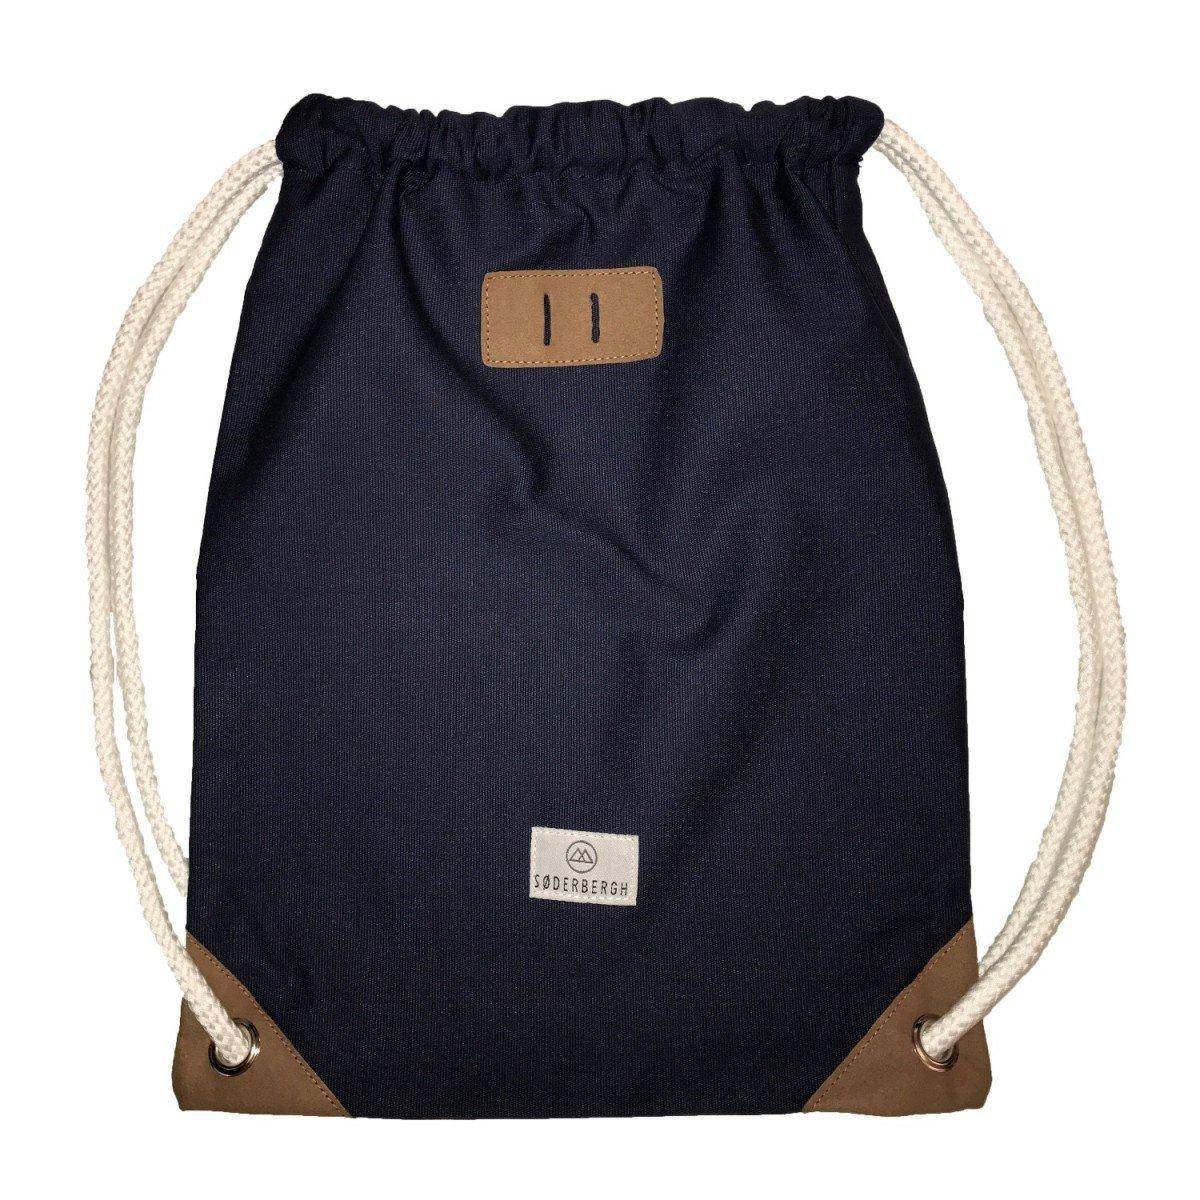 SODERBERGH Sacs de sport Sac à dos sac en toile Hipster Unisexe Femme Homme Enfant, Farbe:Blue